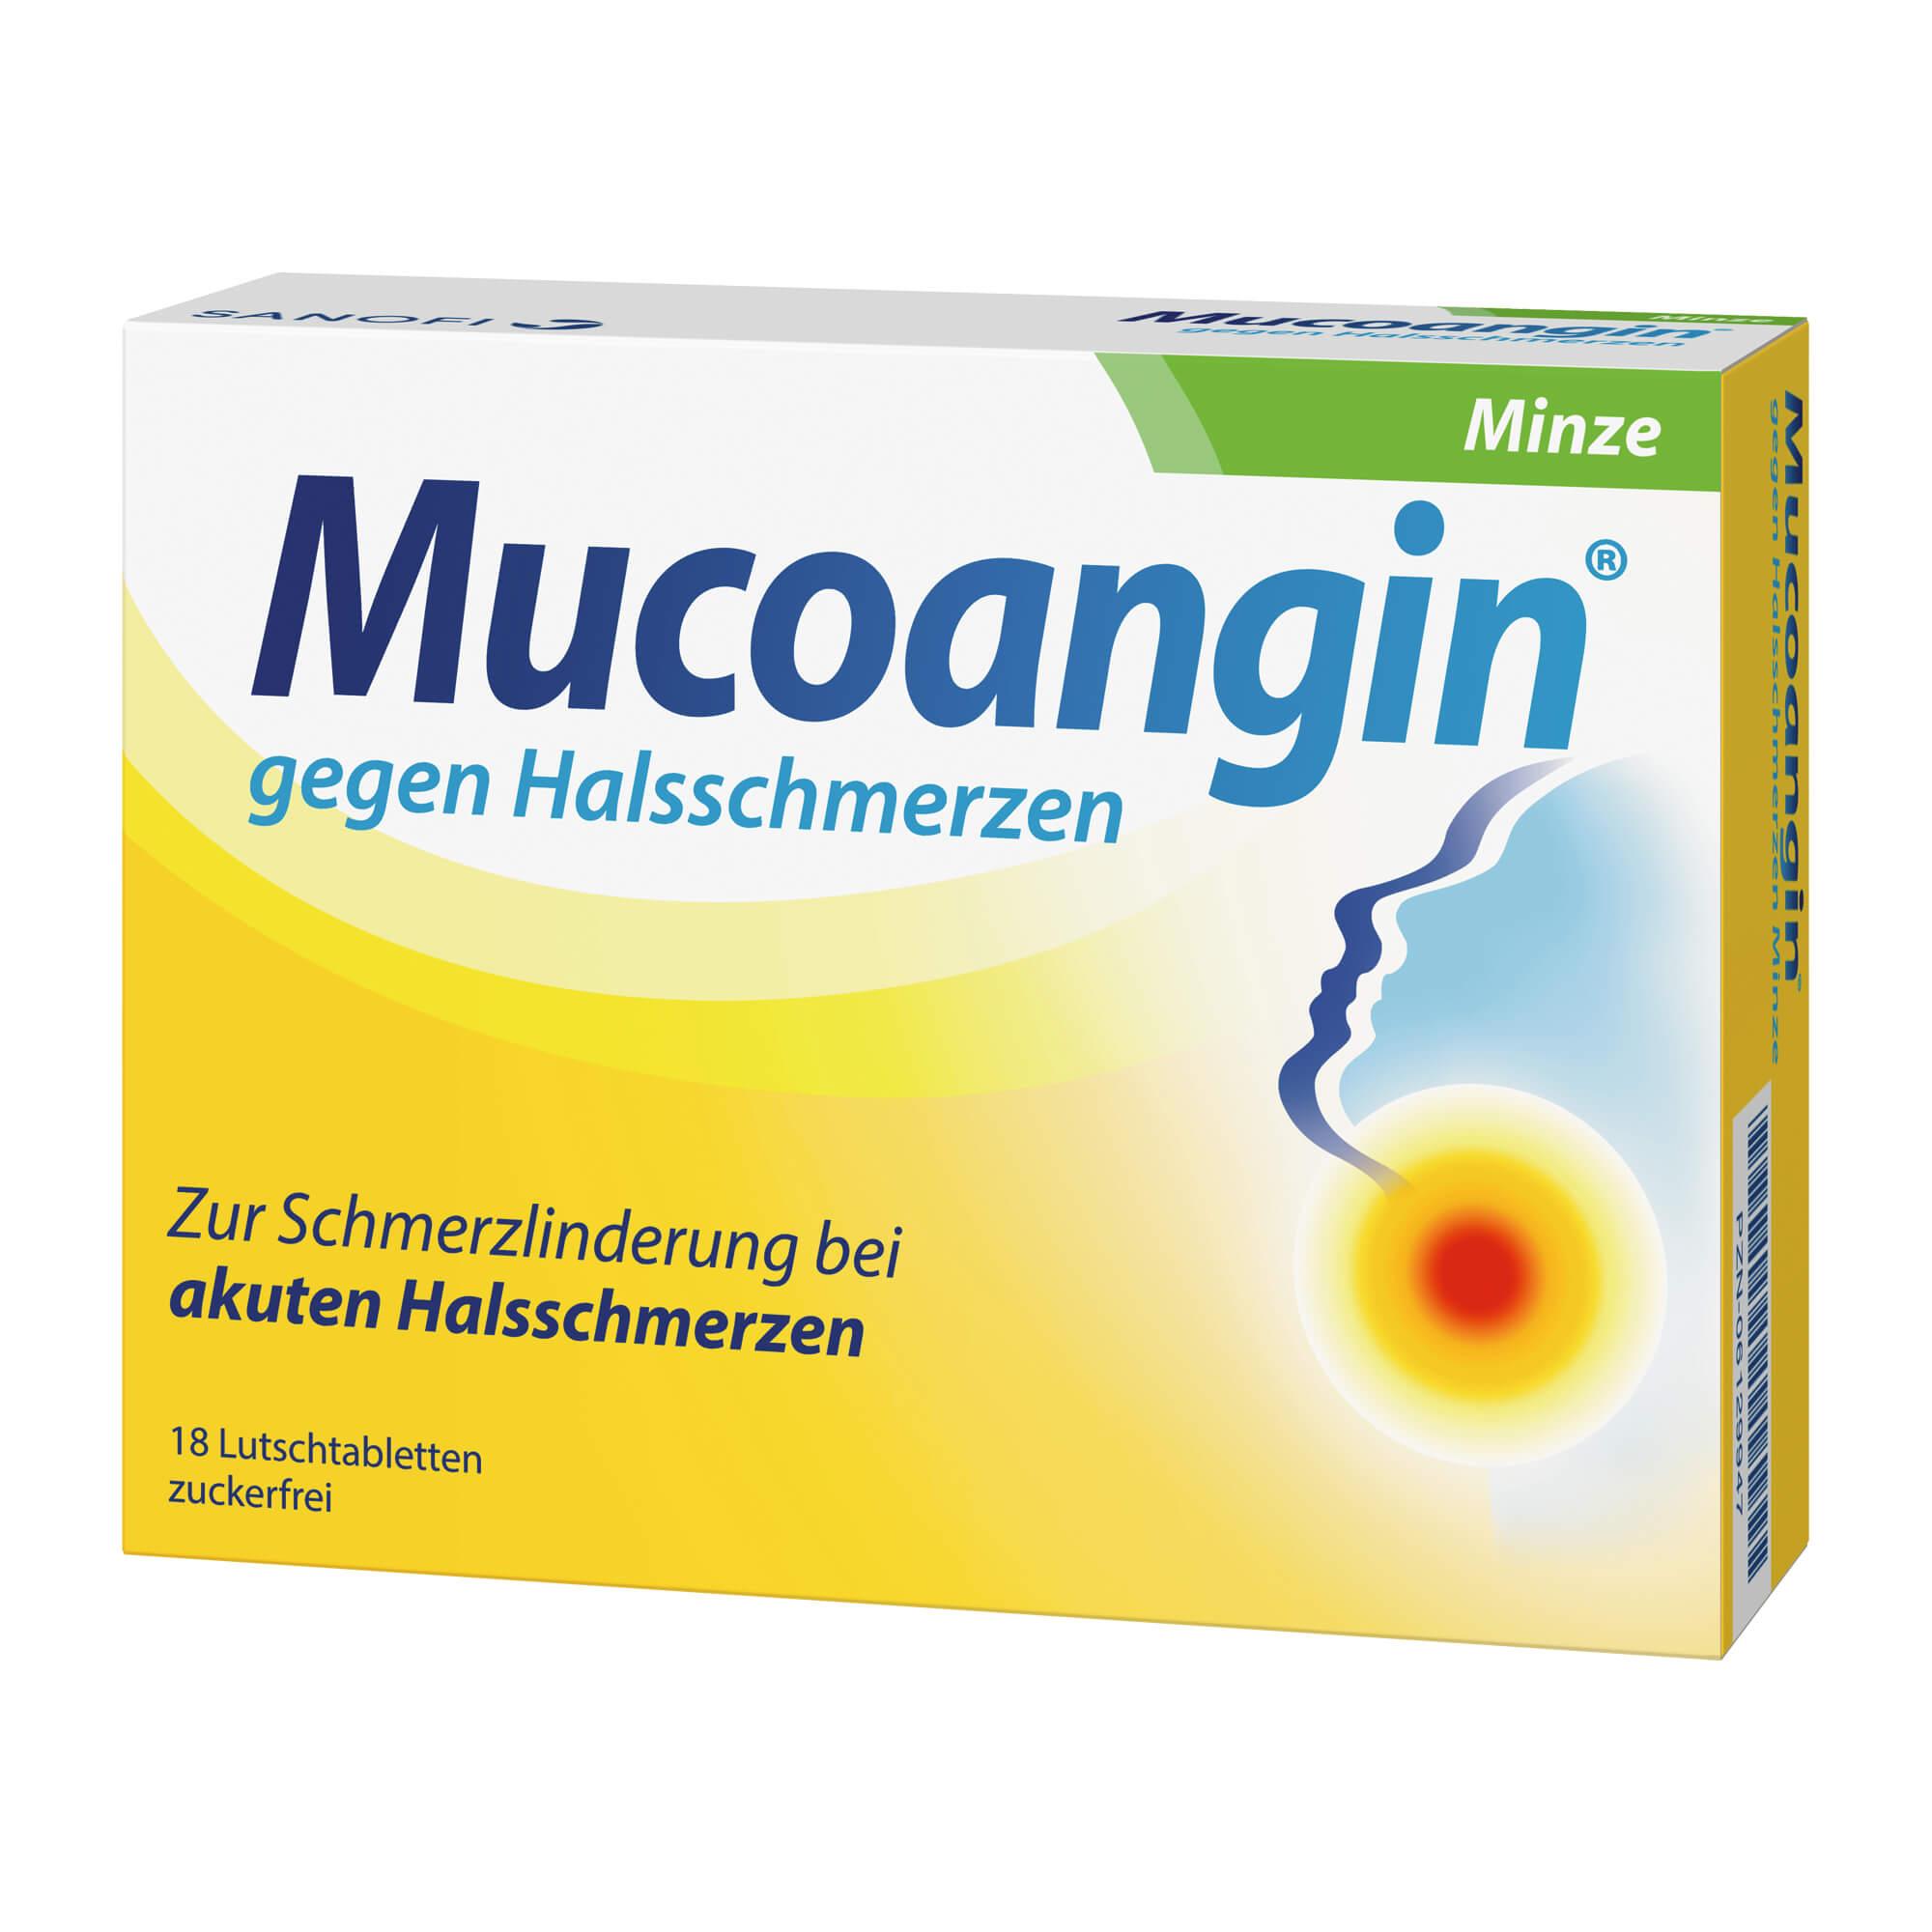 Mucoangin Minze 20 mg Lutschtabletten